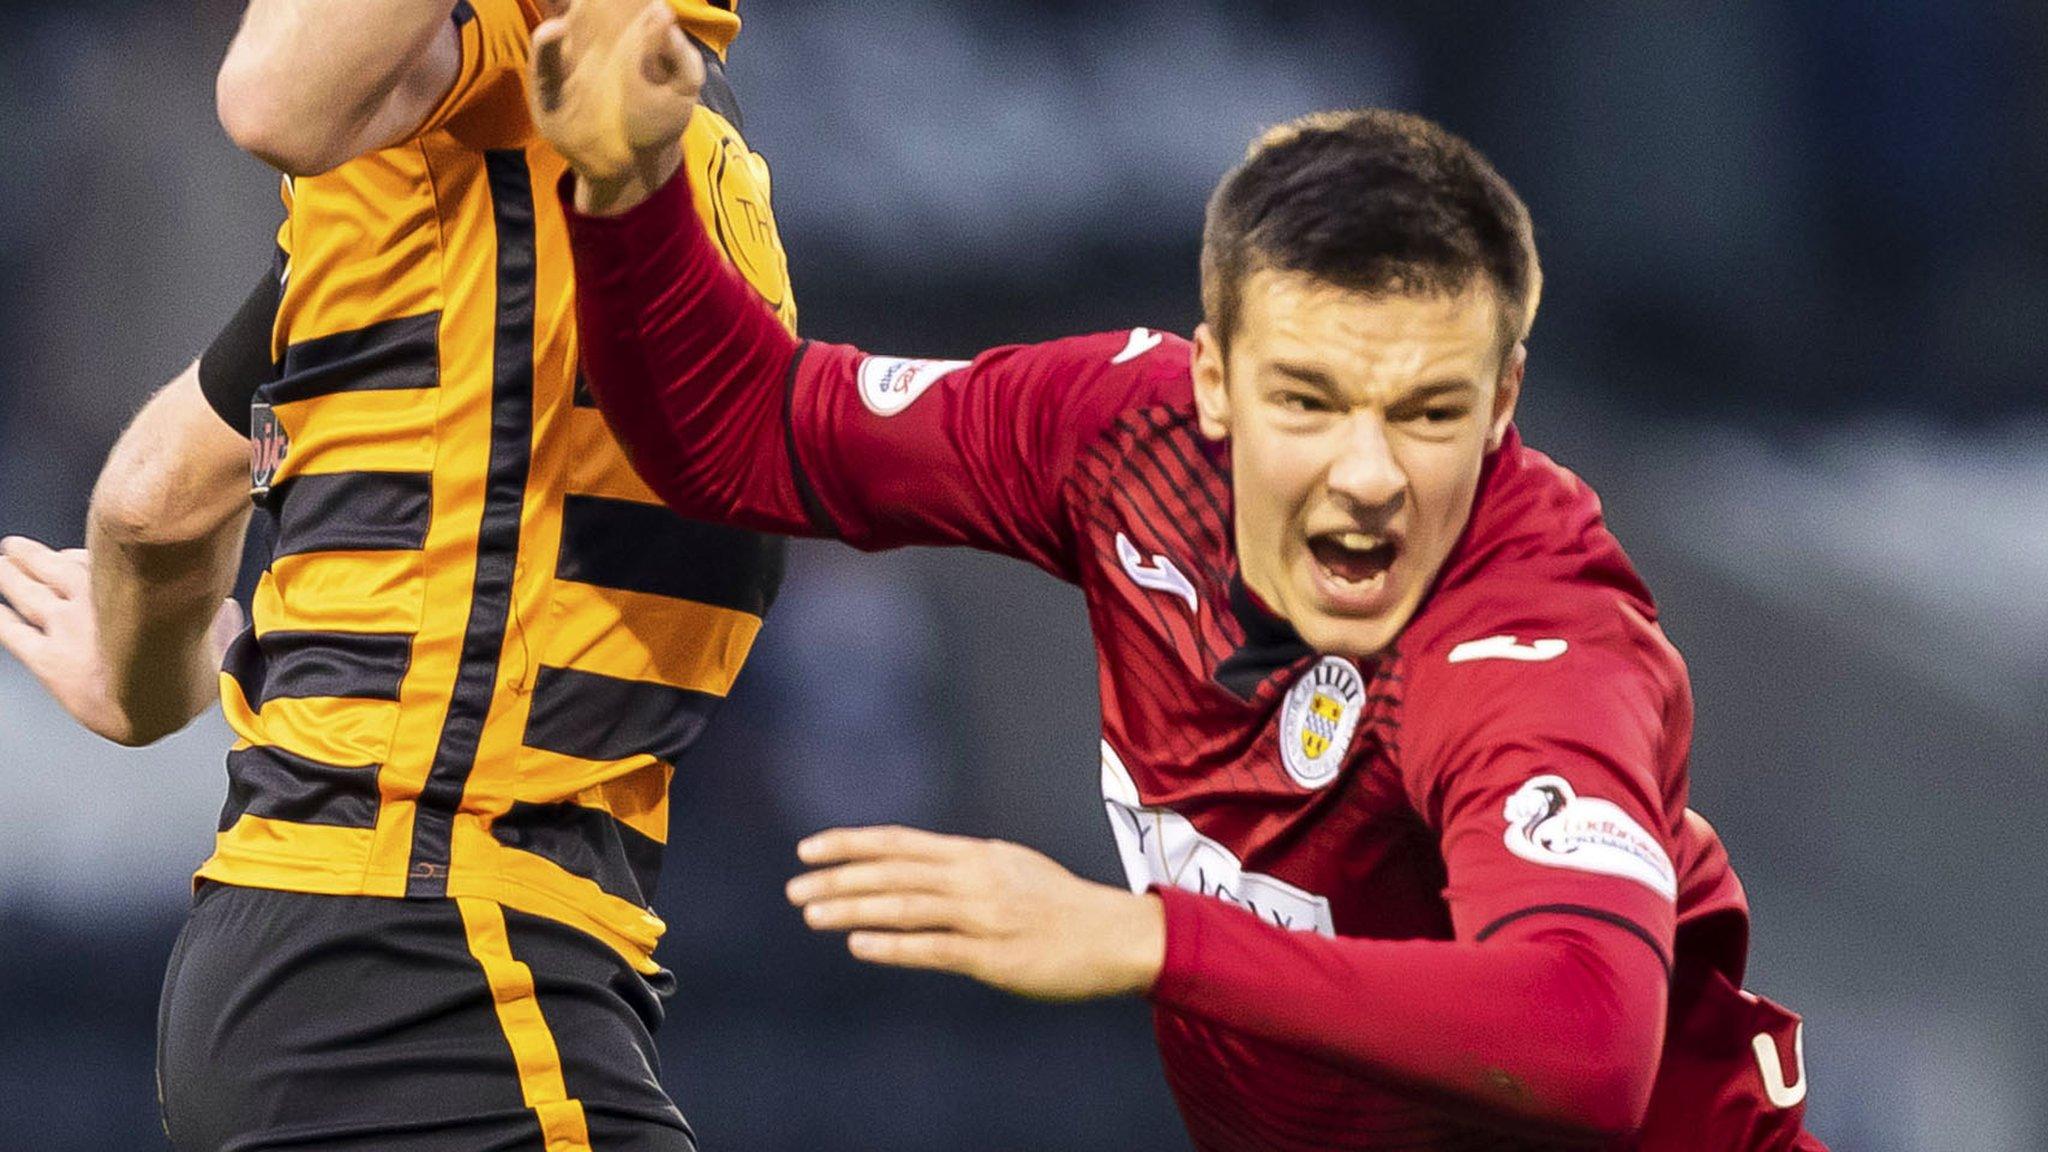 St Mirren's Lyons has debut 'dive' card rescinded